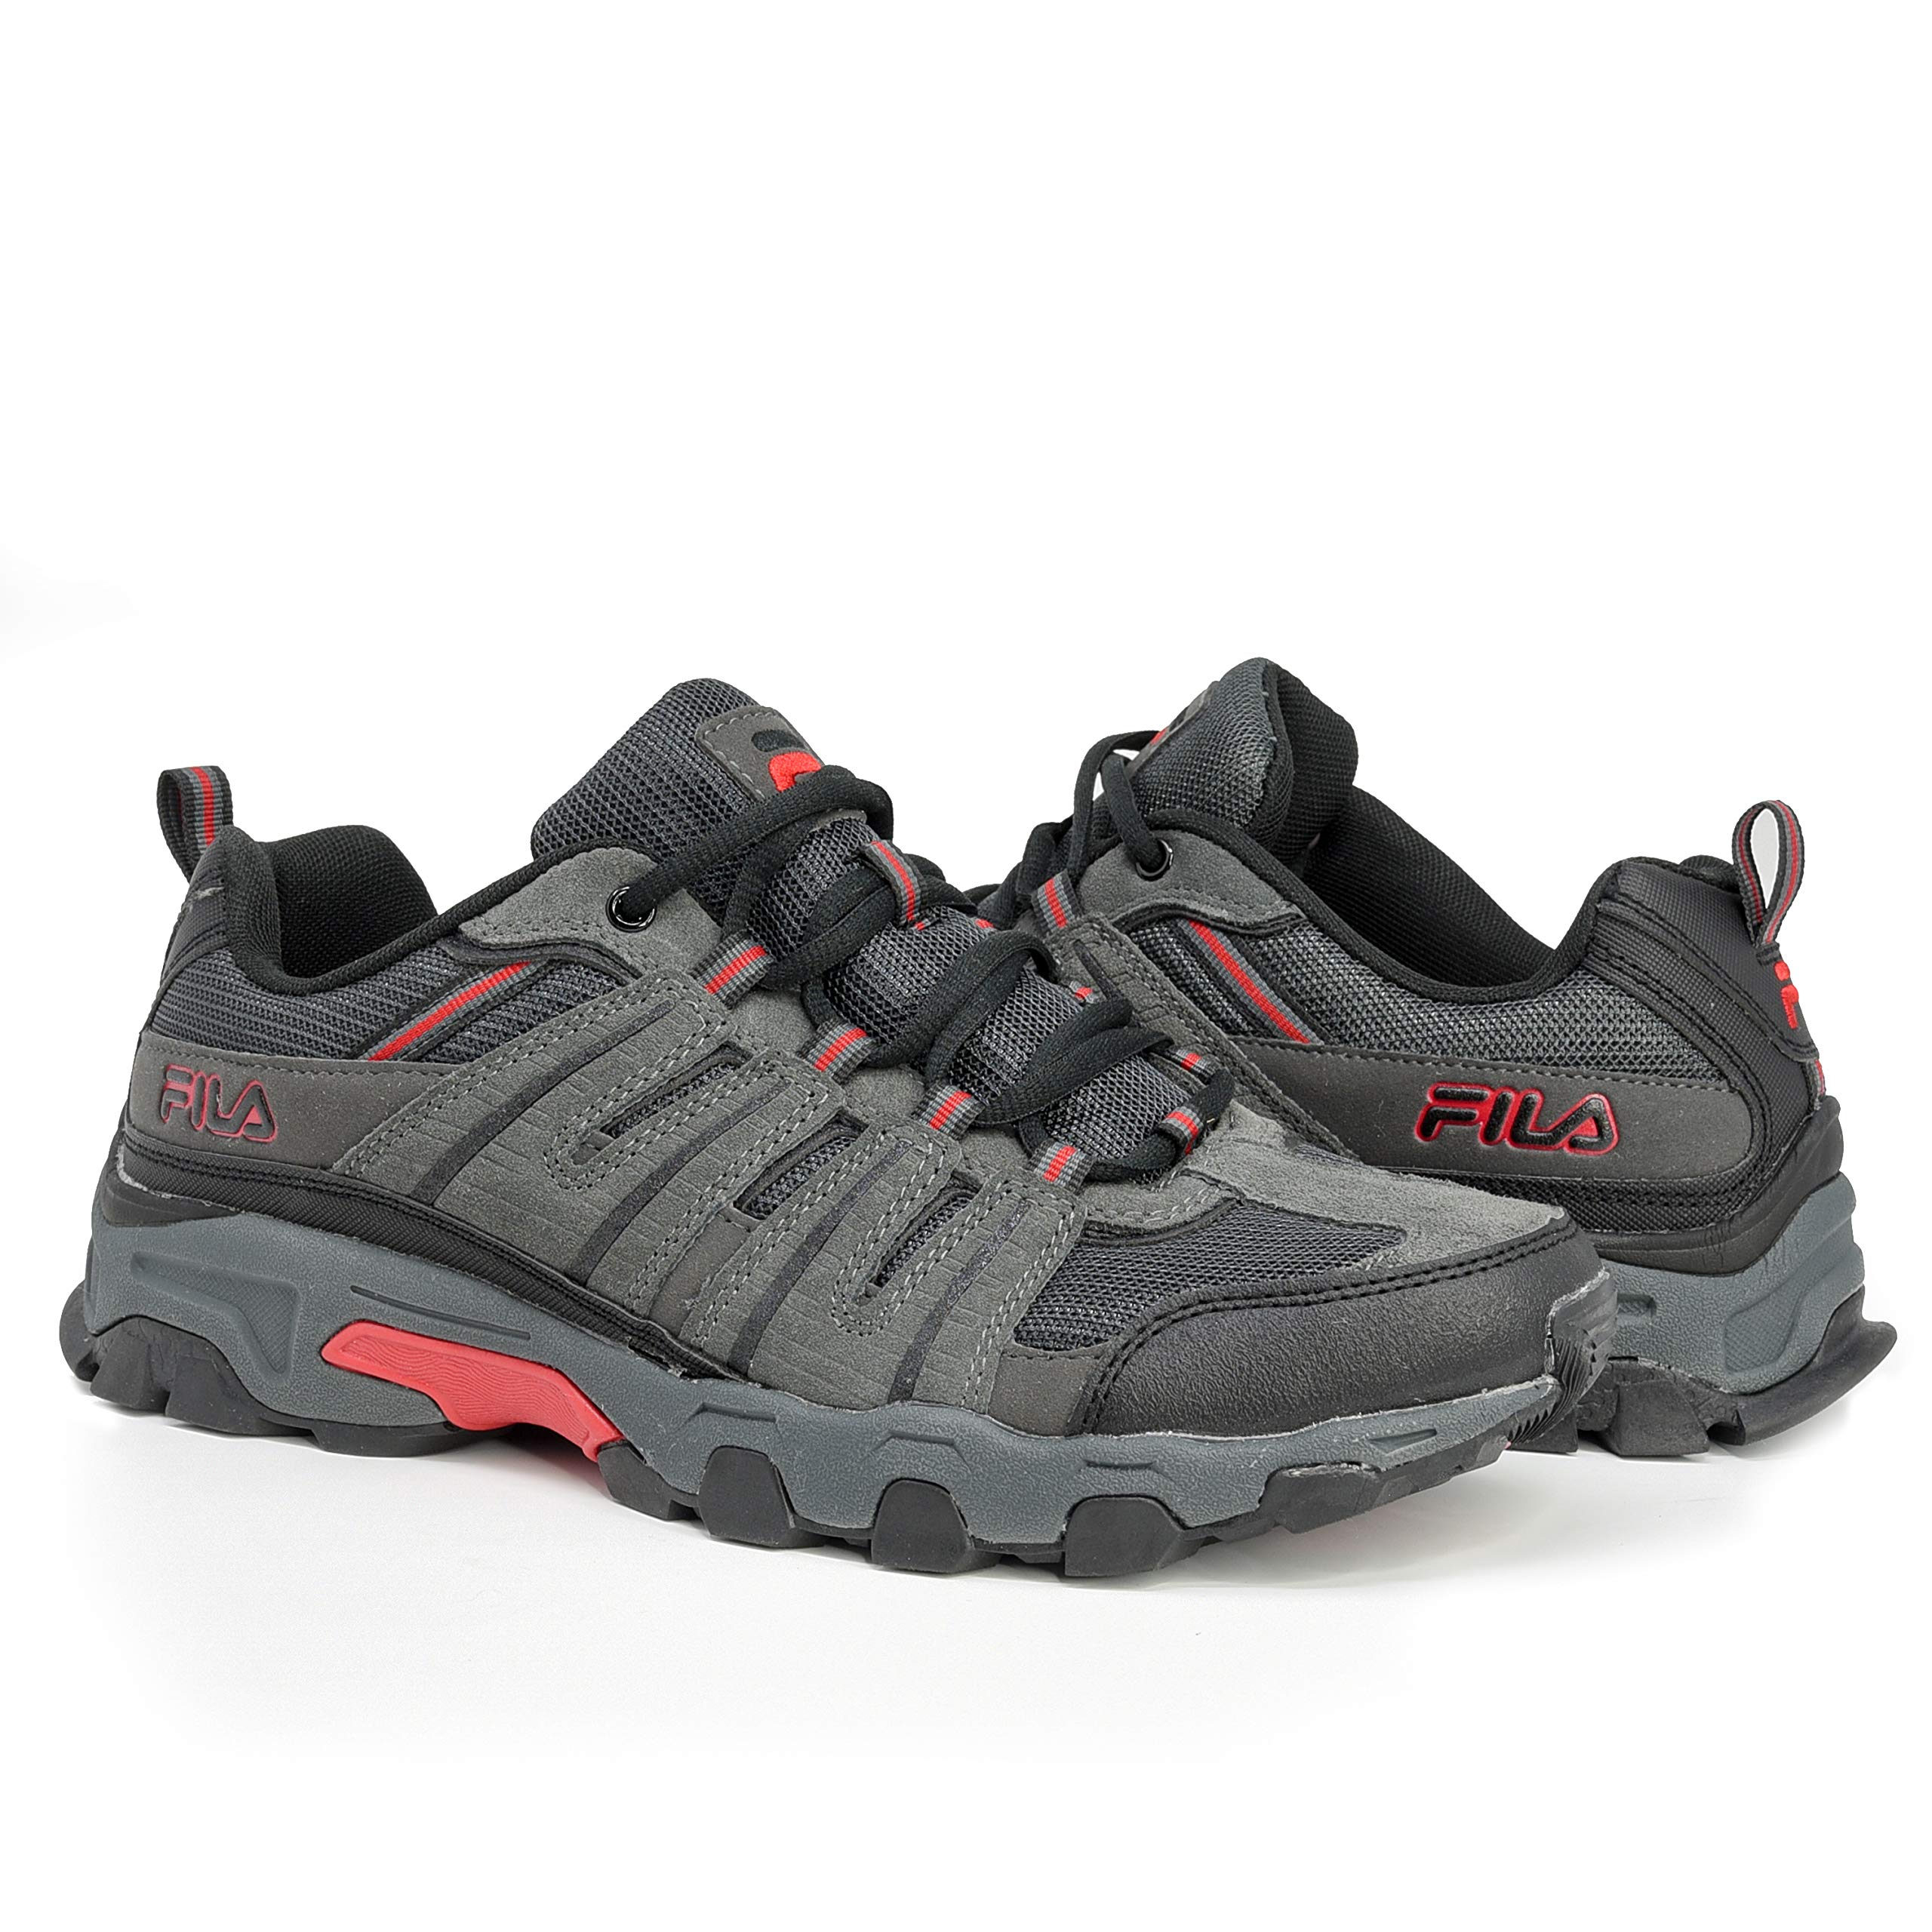 Fila Fila Men's Westmount Trail Running Sneaker EVA Comfort Footbed Shoe, GreyBlackRed, Size 11.5